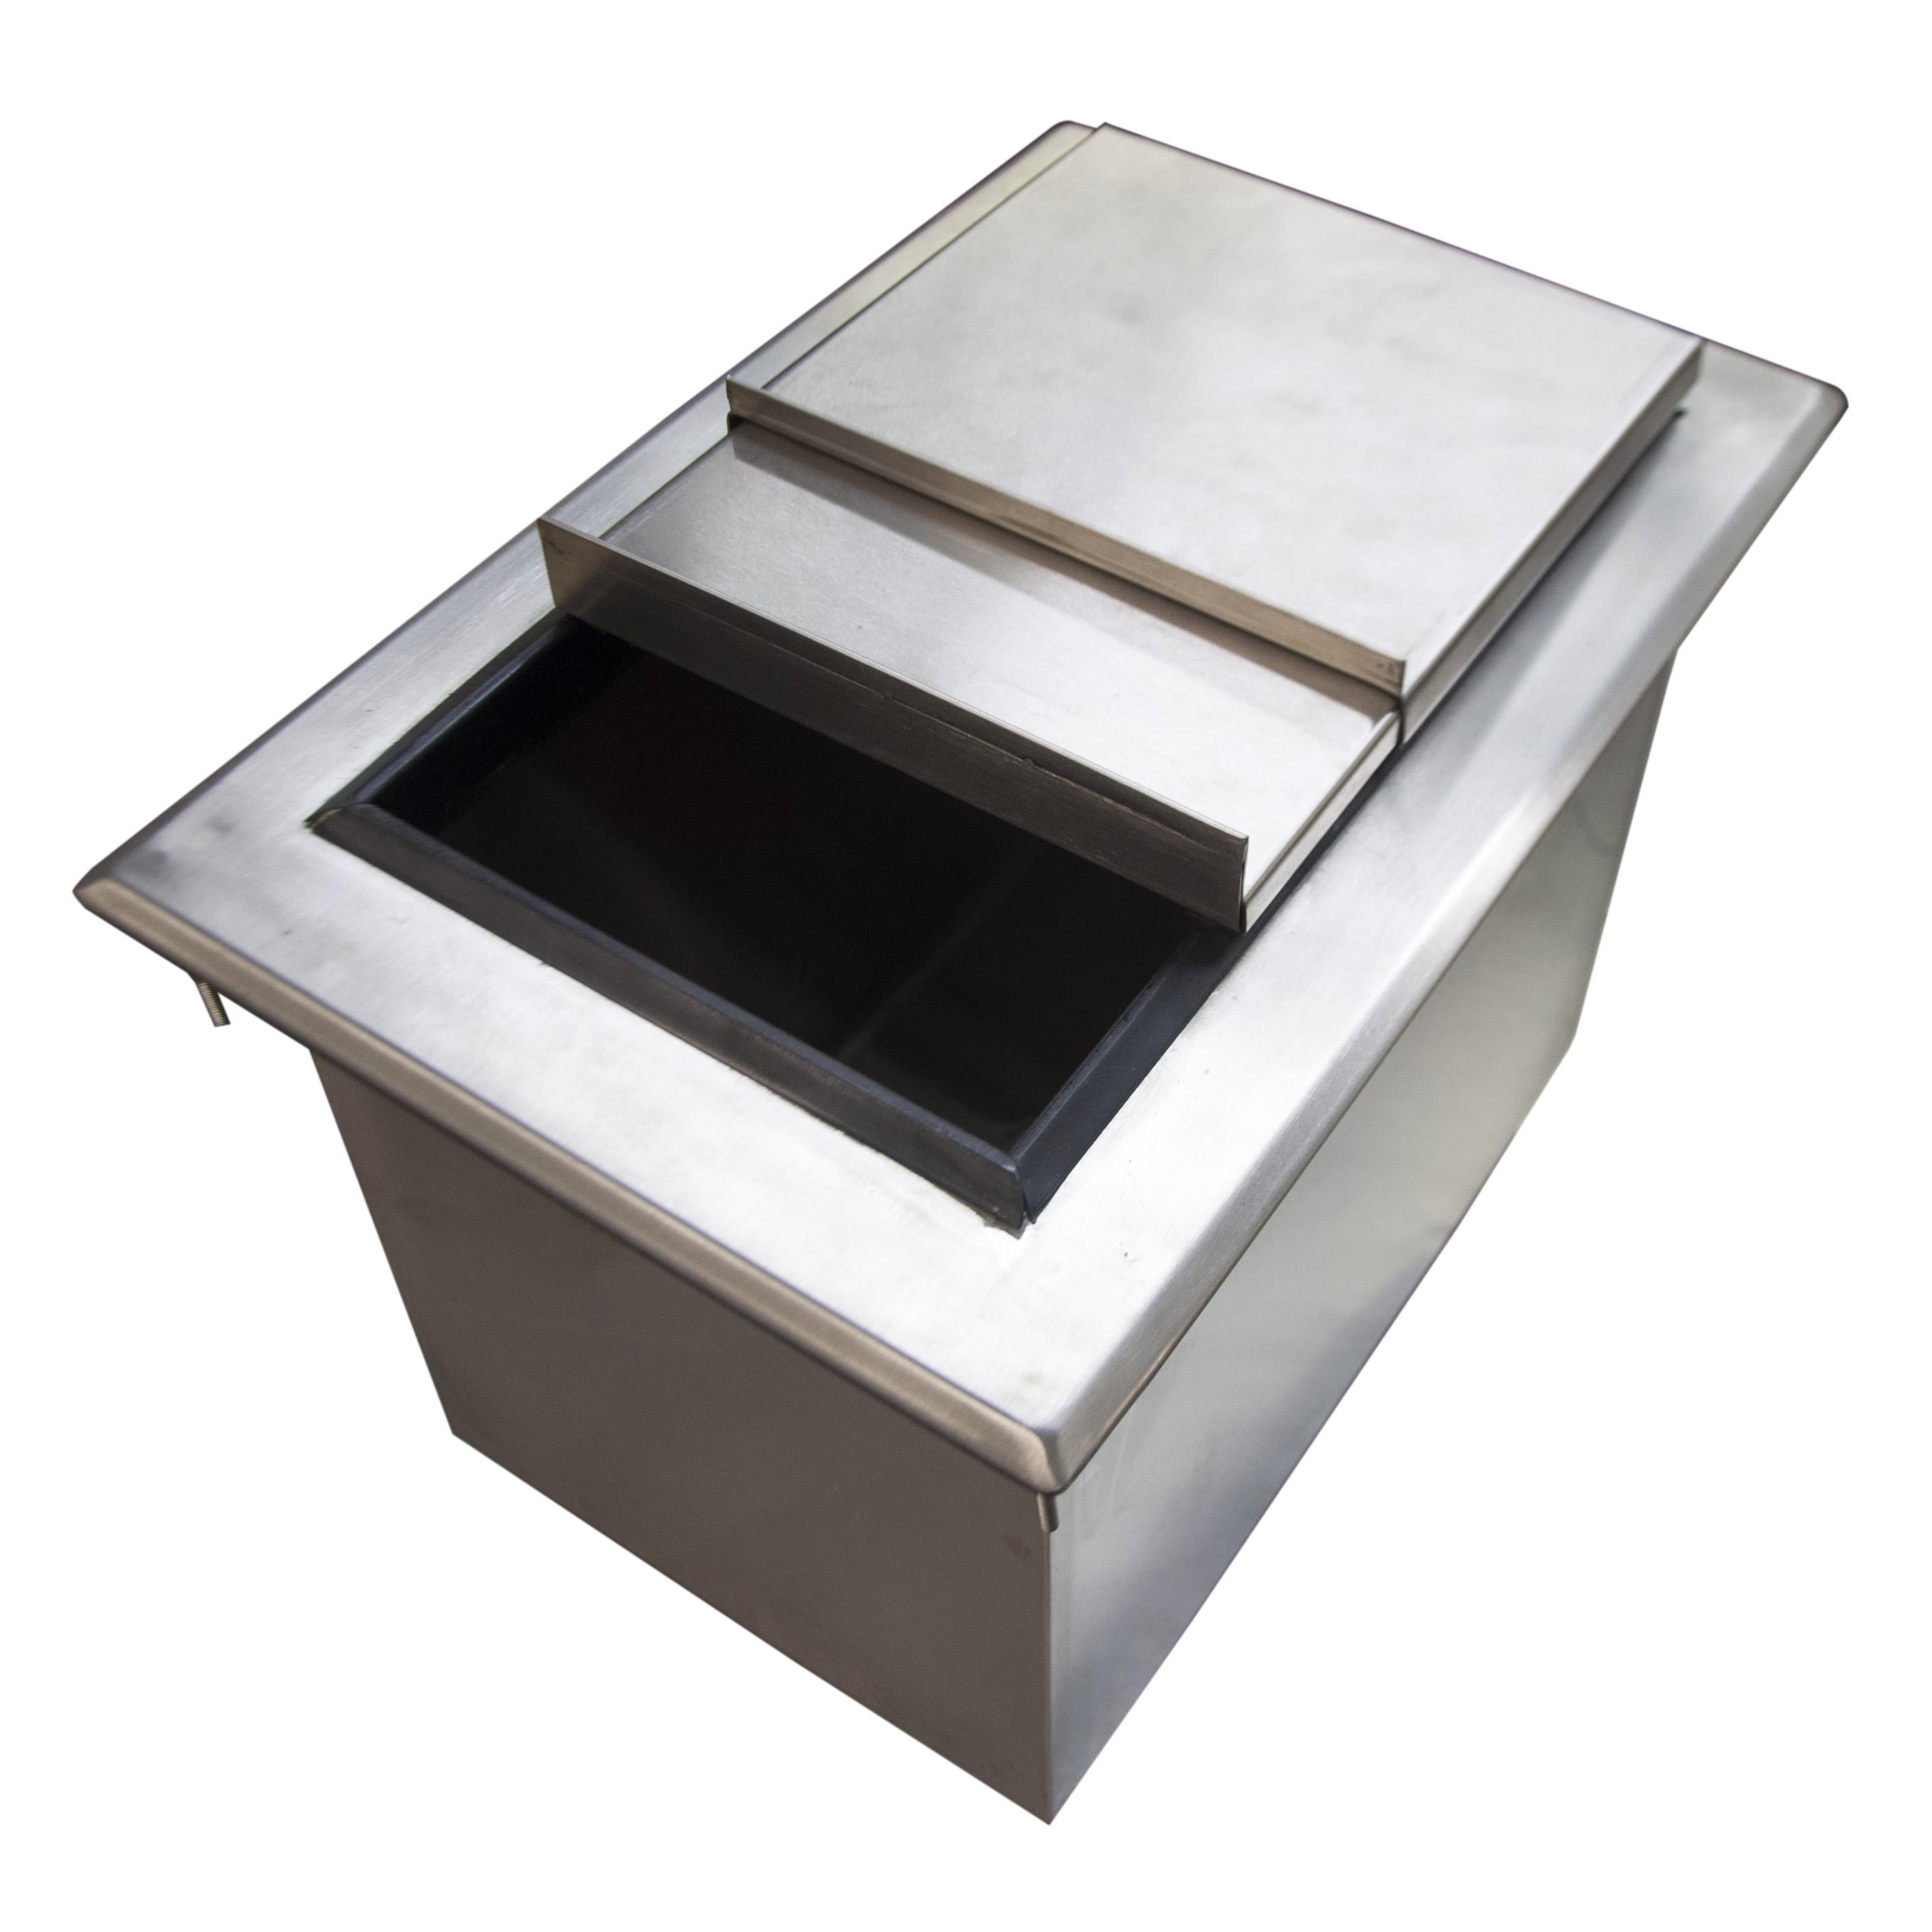 BK Resources BK-DIBL-2218 ice bin, drop-in